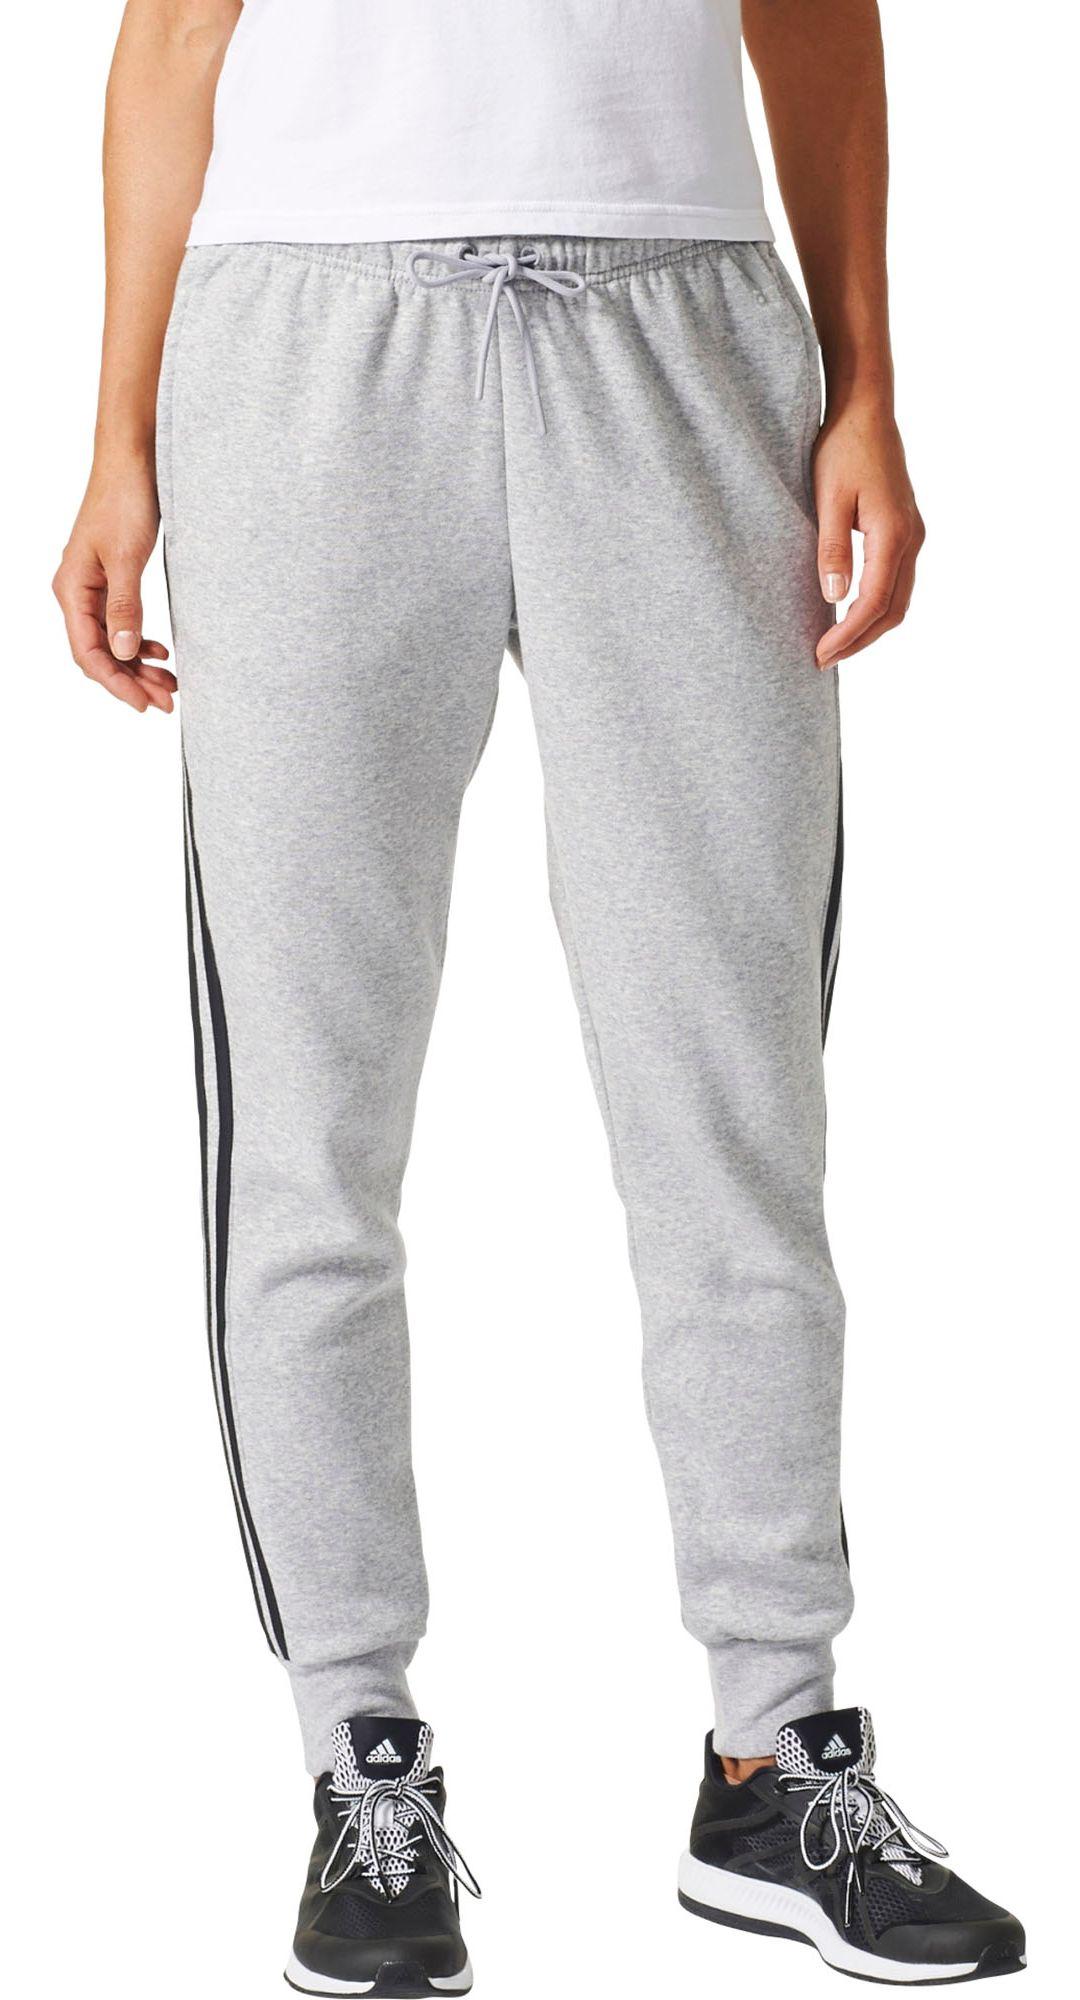 a7caaa211d adidas Women's Essentials Cotton Fleece 3-Stripes Jogger Pants